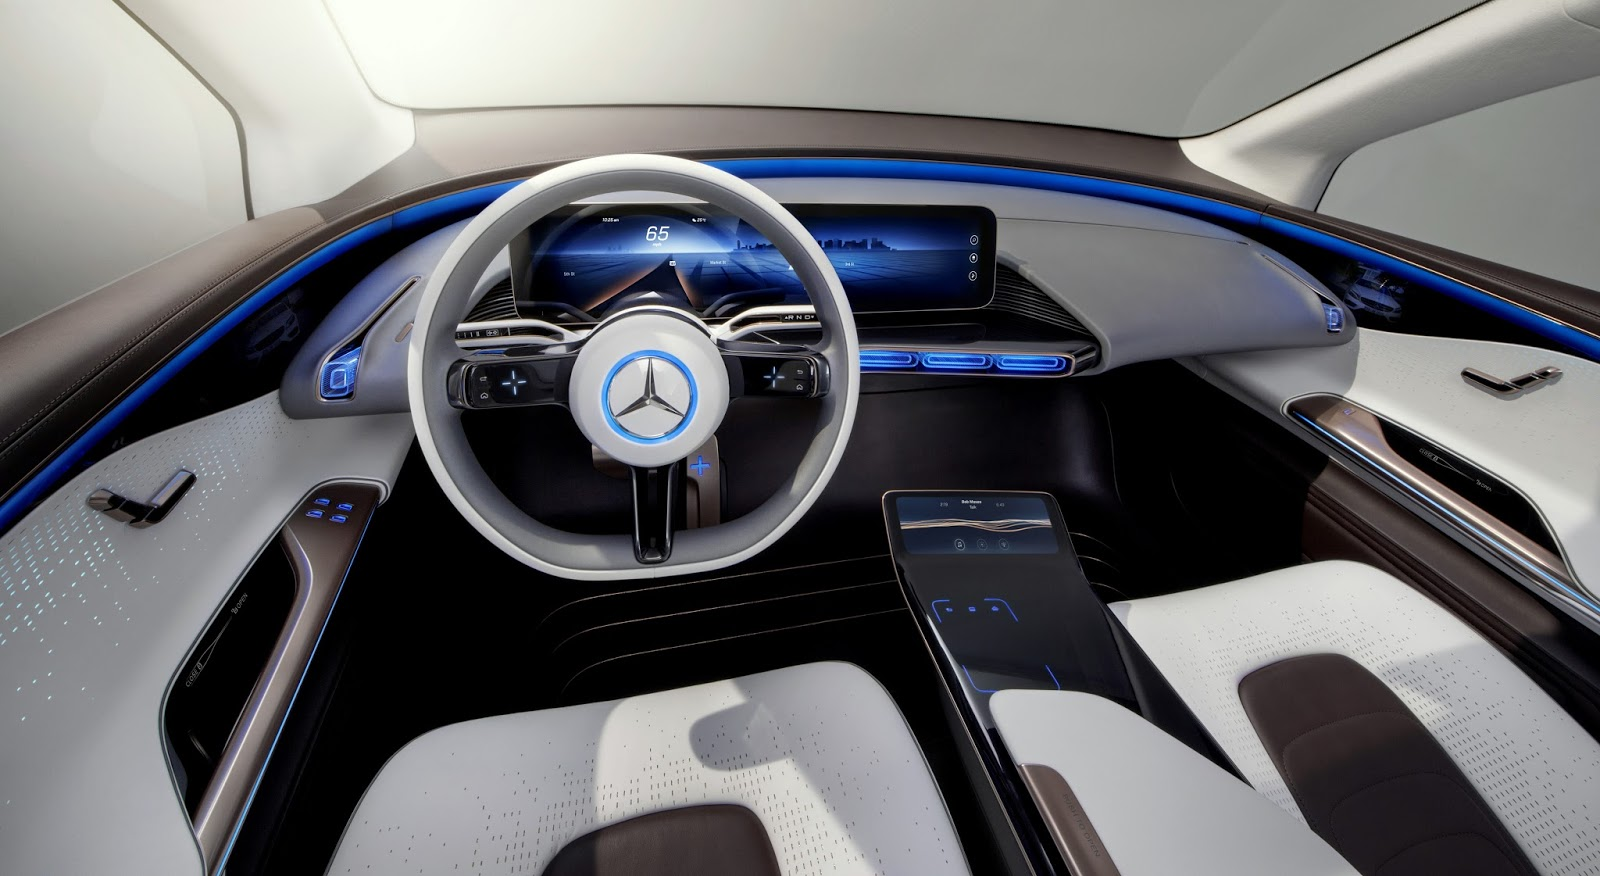 ключ для электромобиля mercedes v8 #3